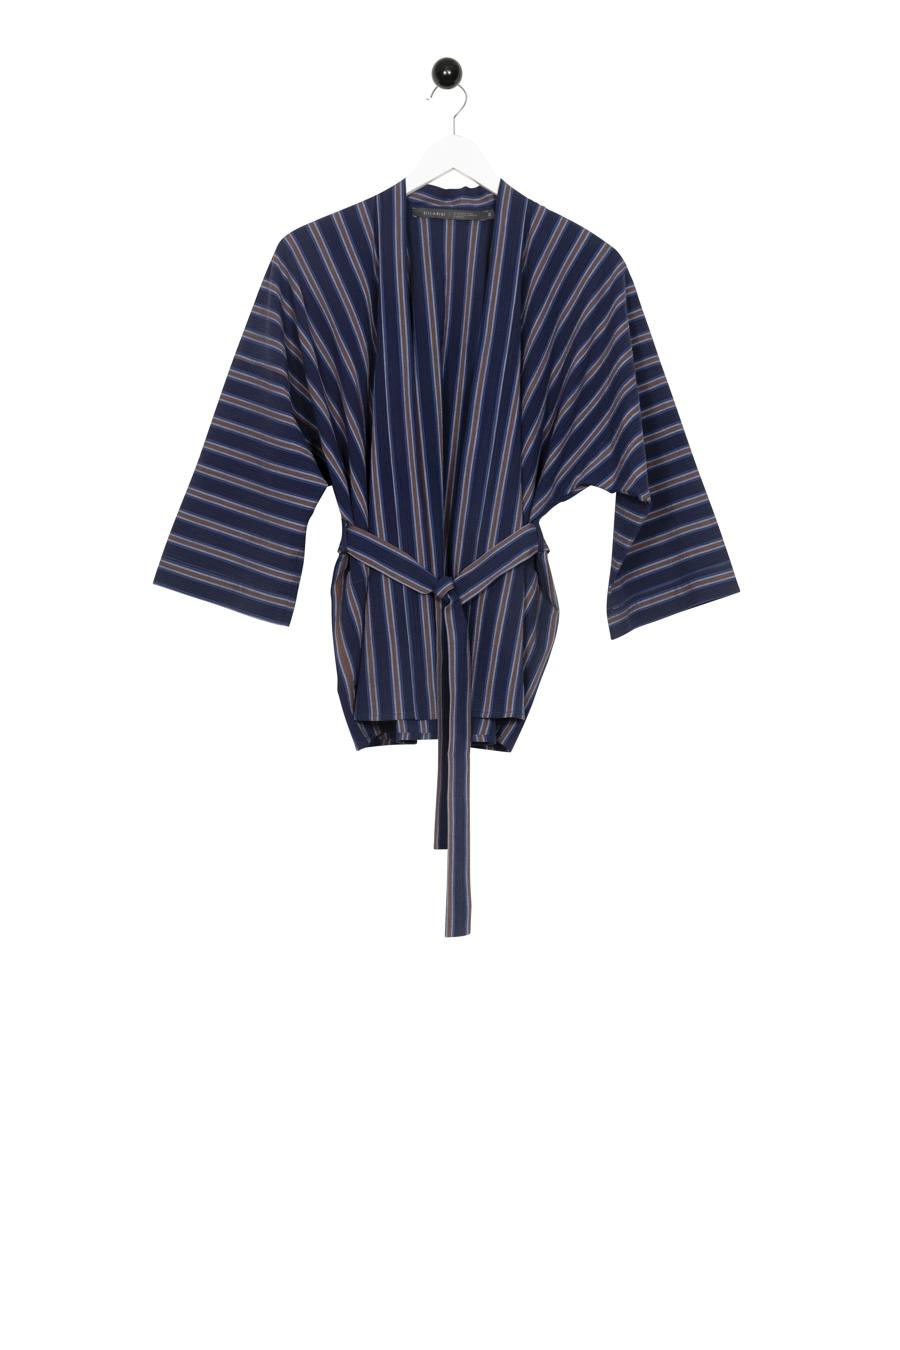 Hornstull Kimono